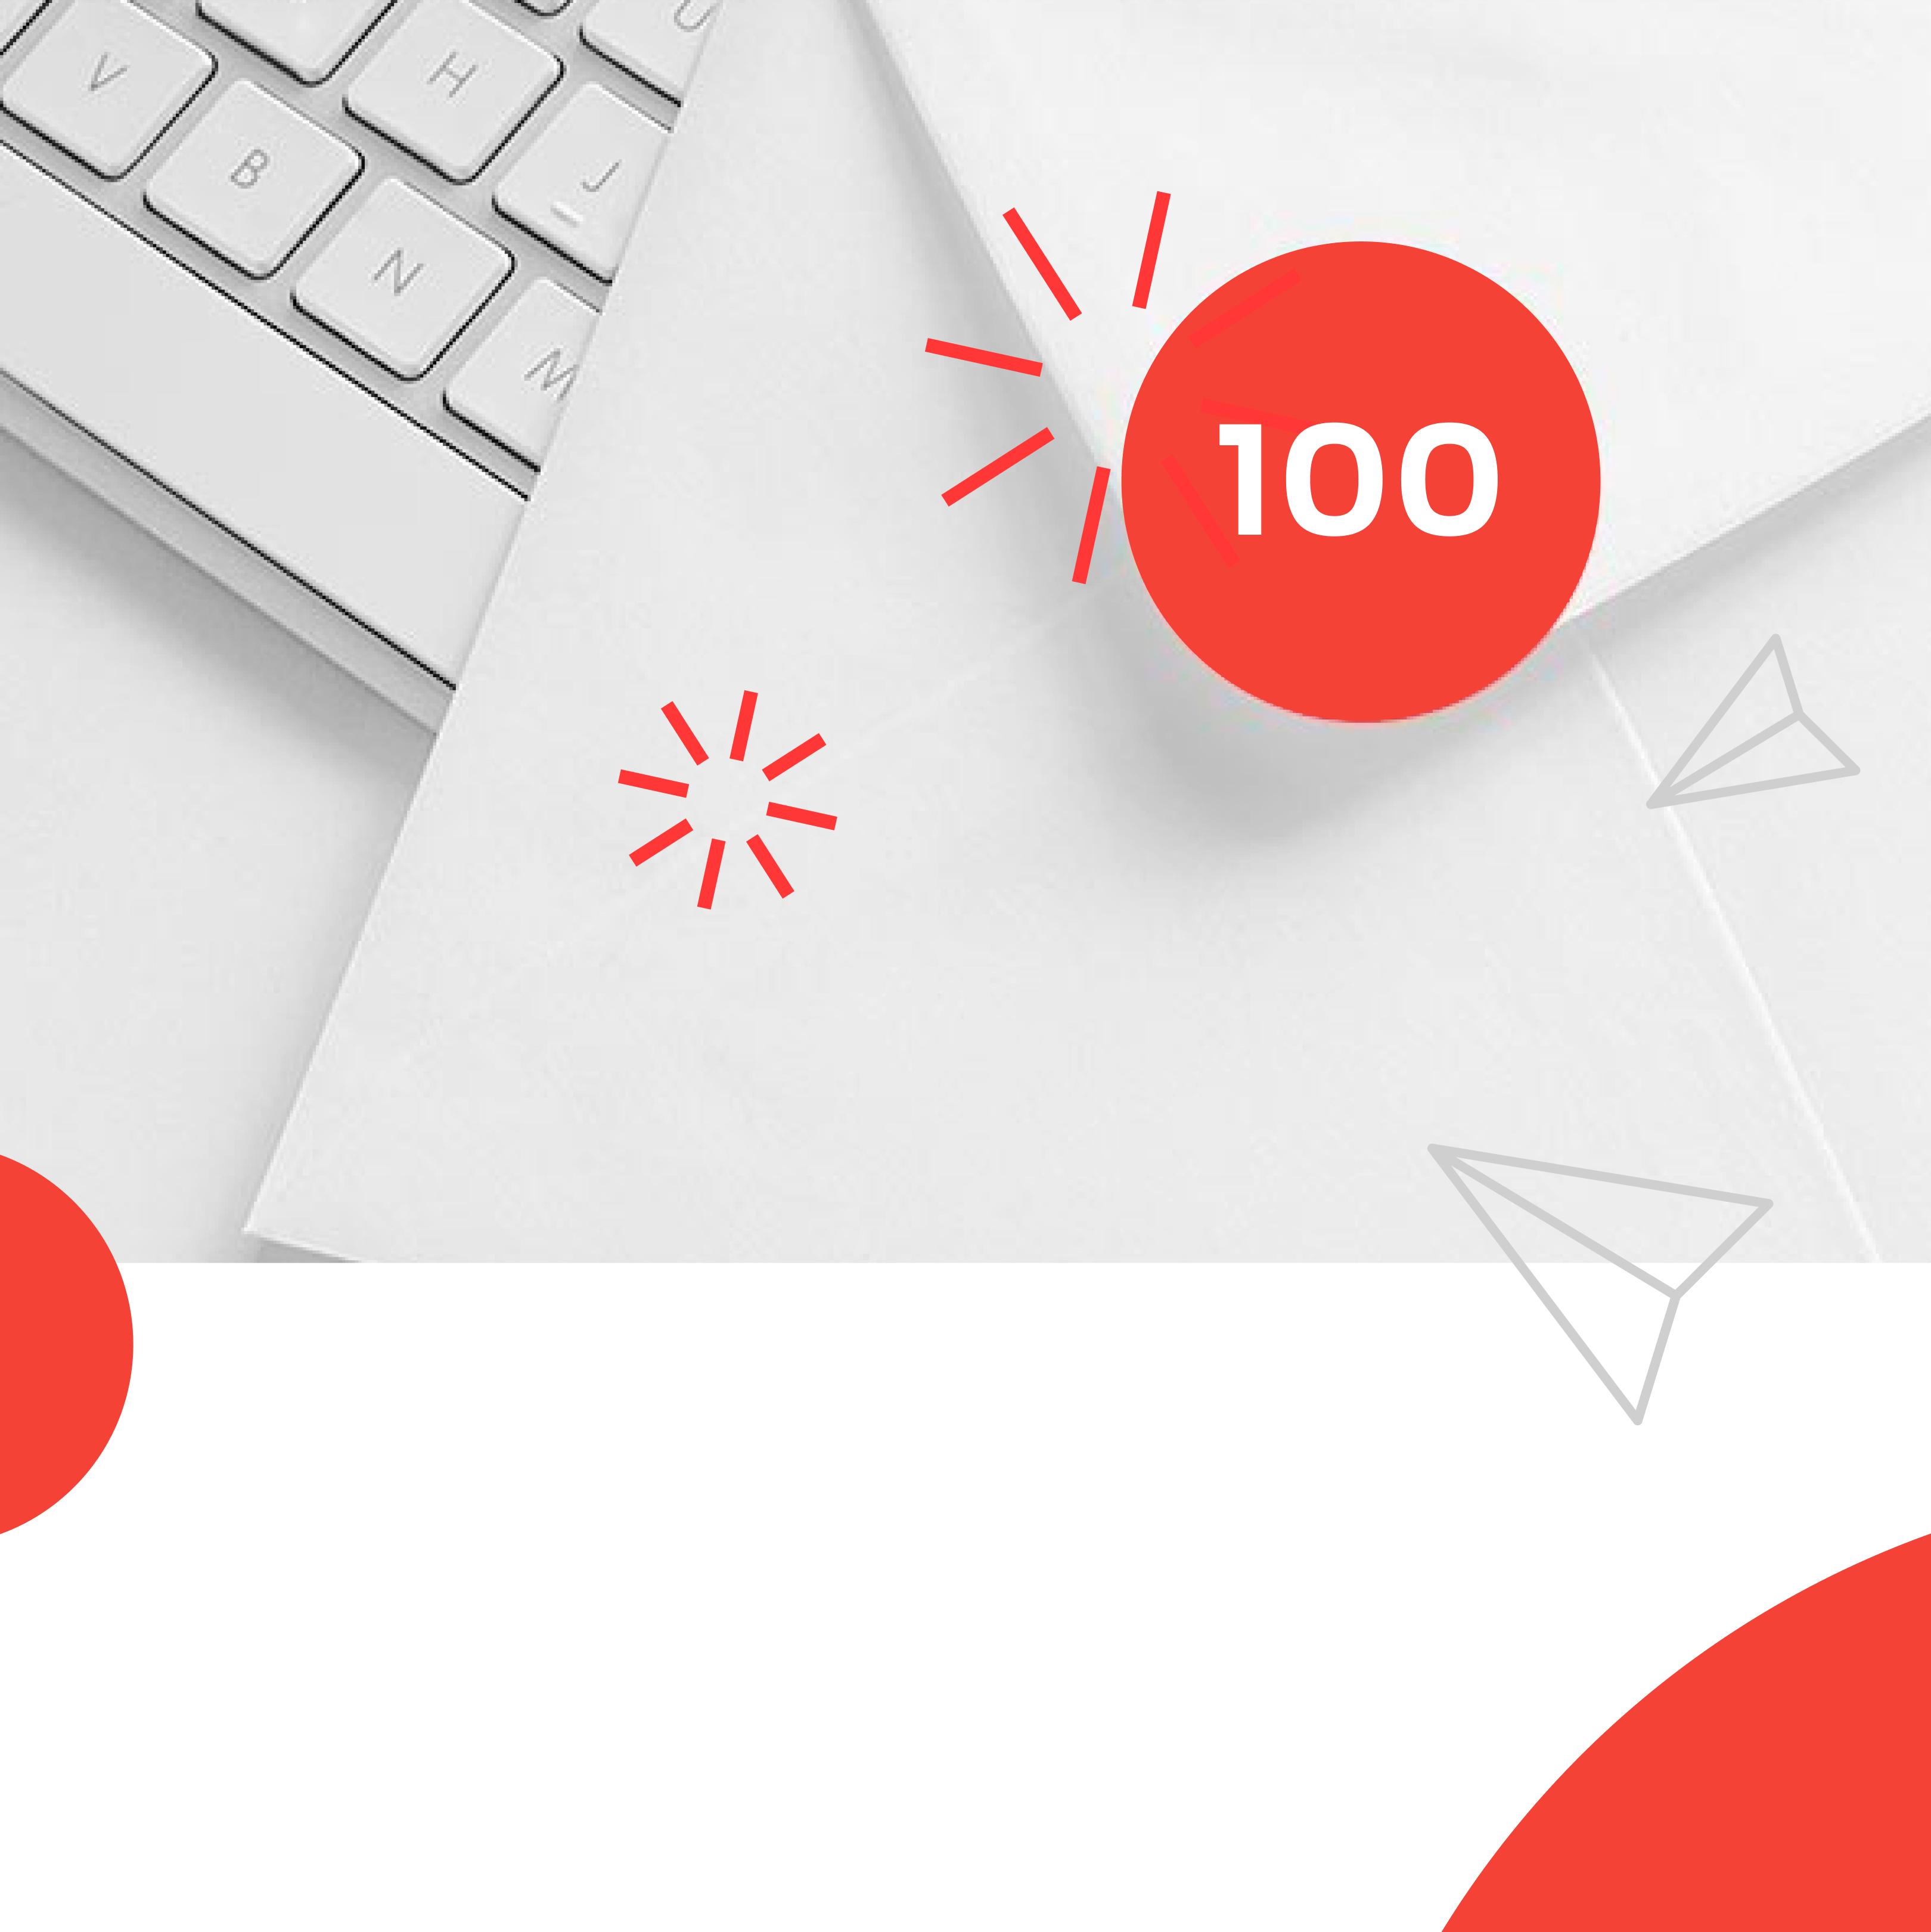 Email-рассылка ≠ СПАМ